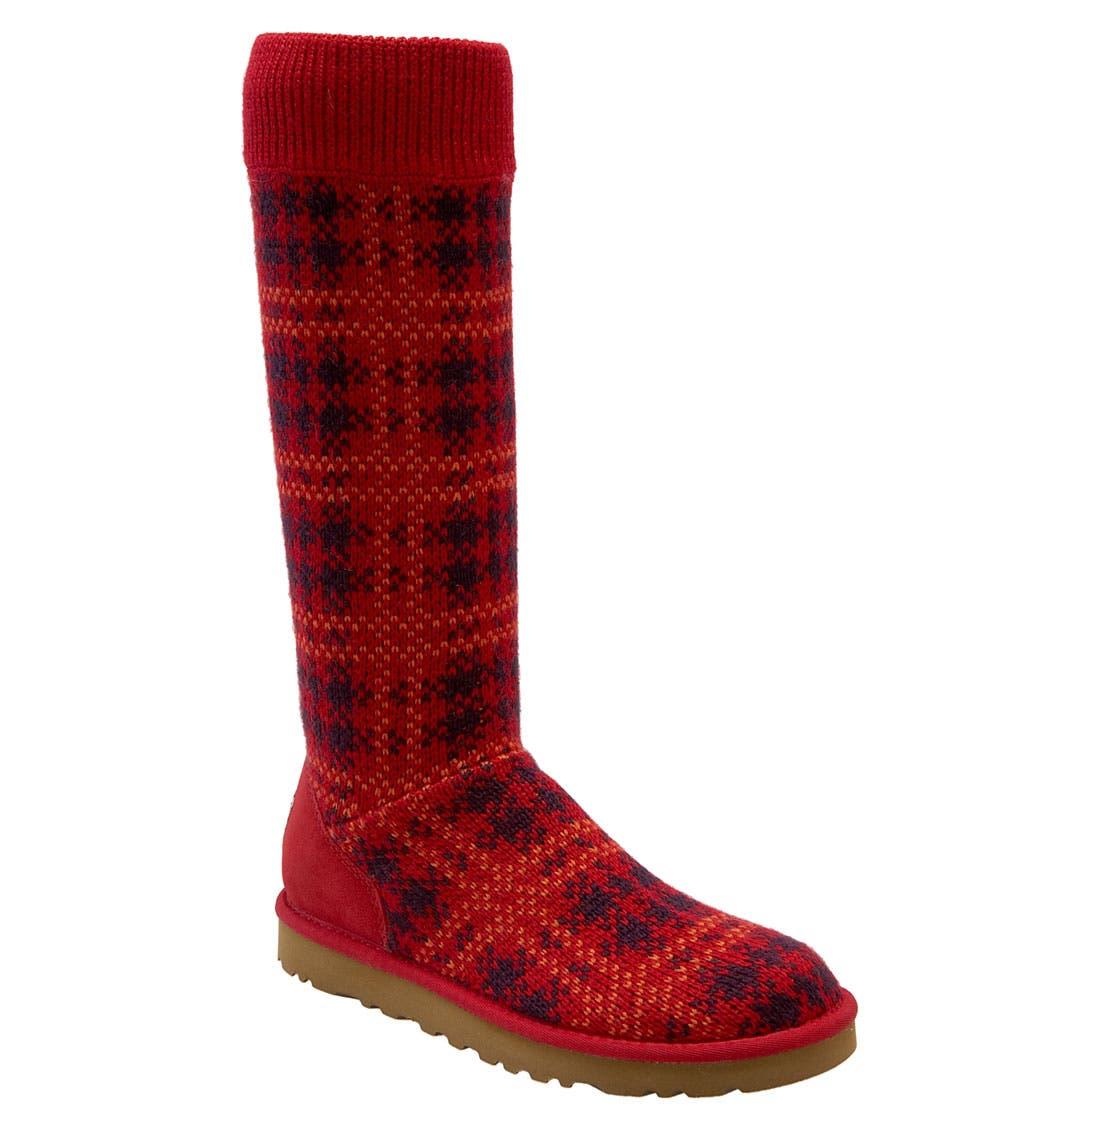 Main Image - UGG® Australia Plaid Knit Boot (Women)